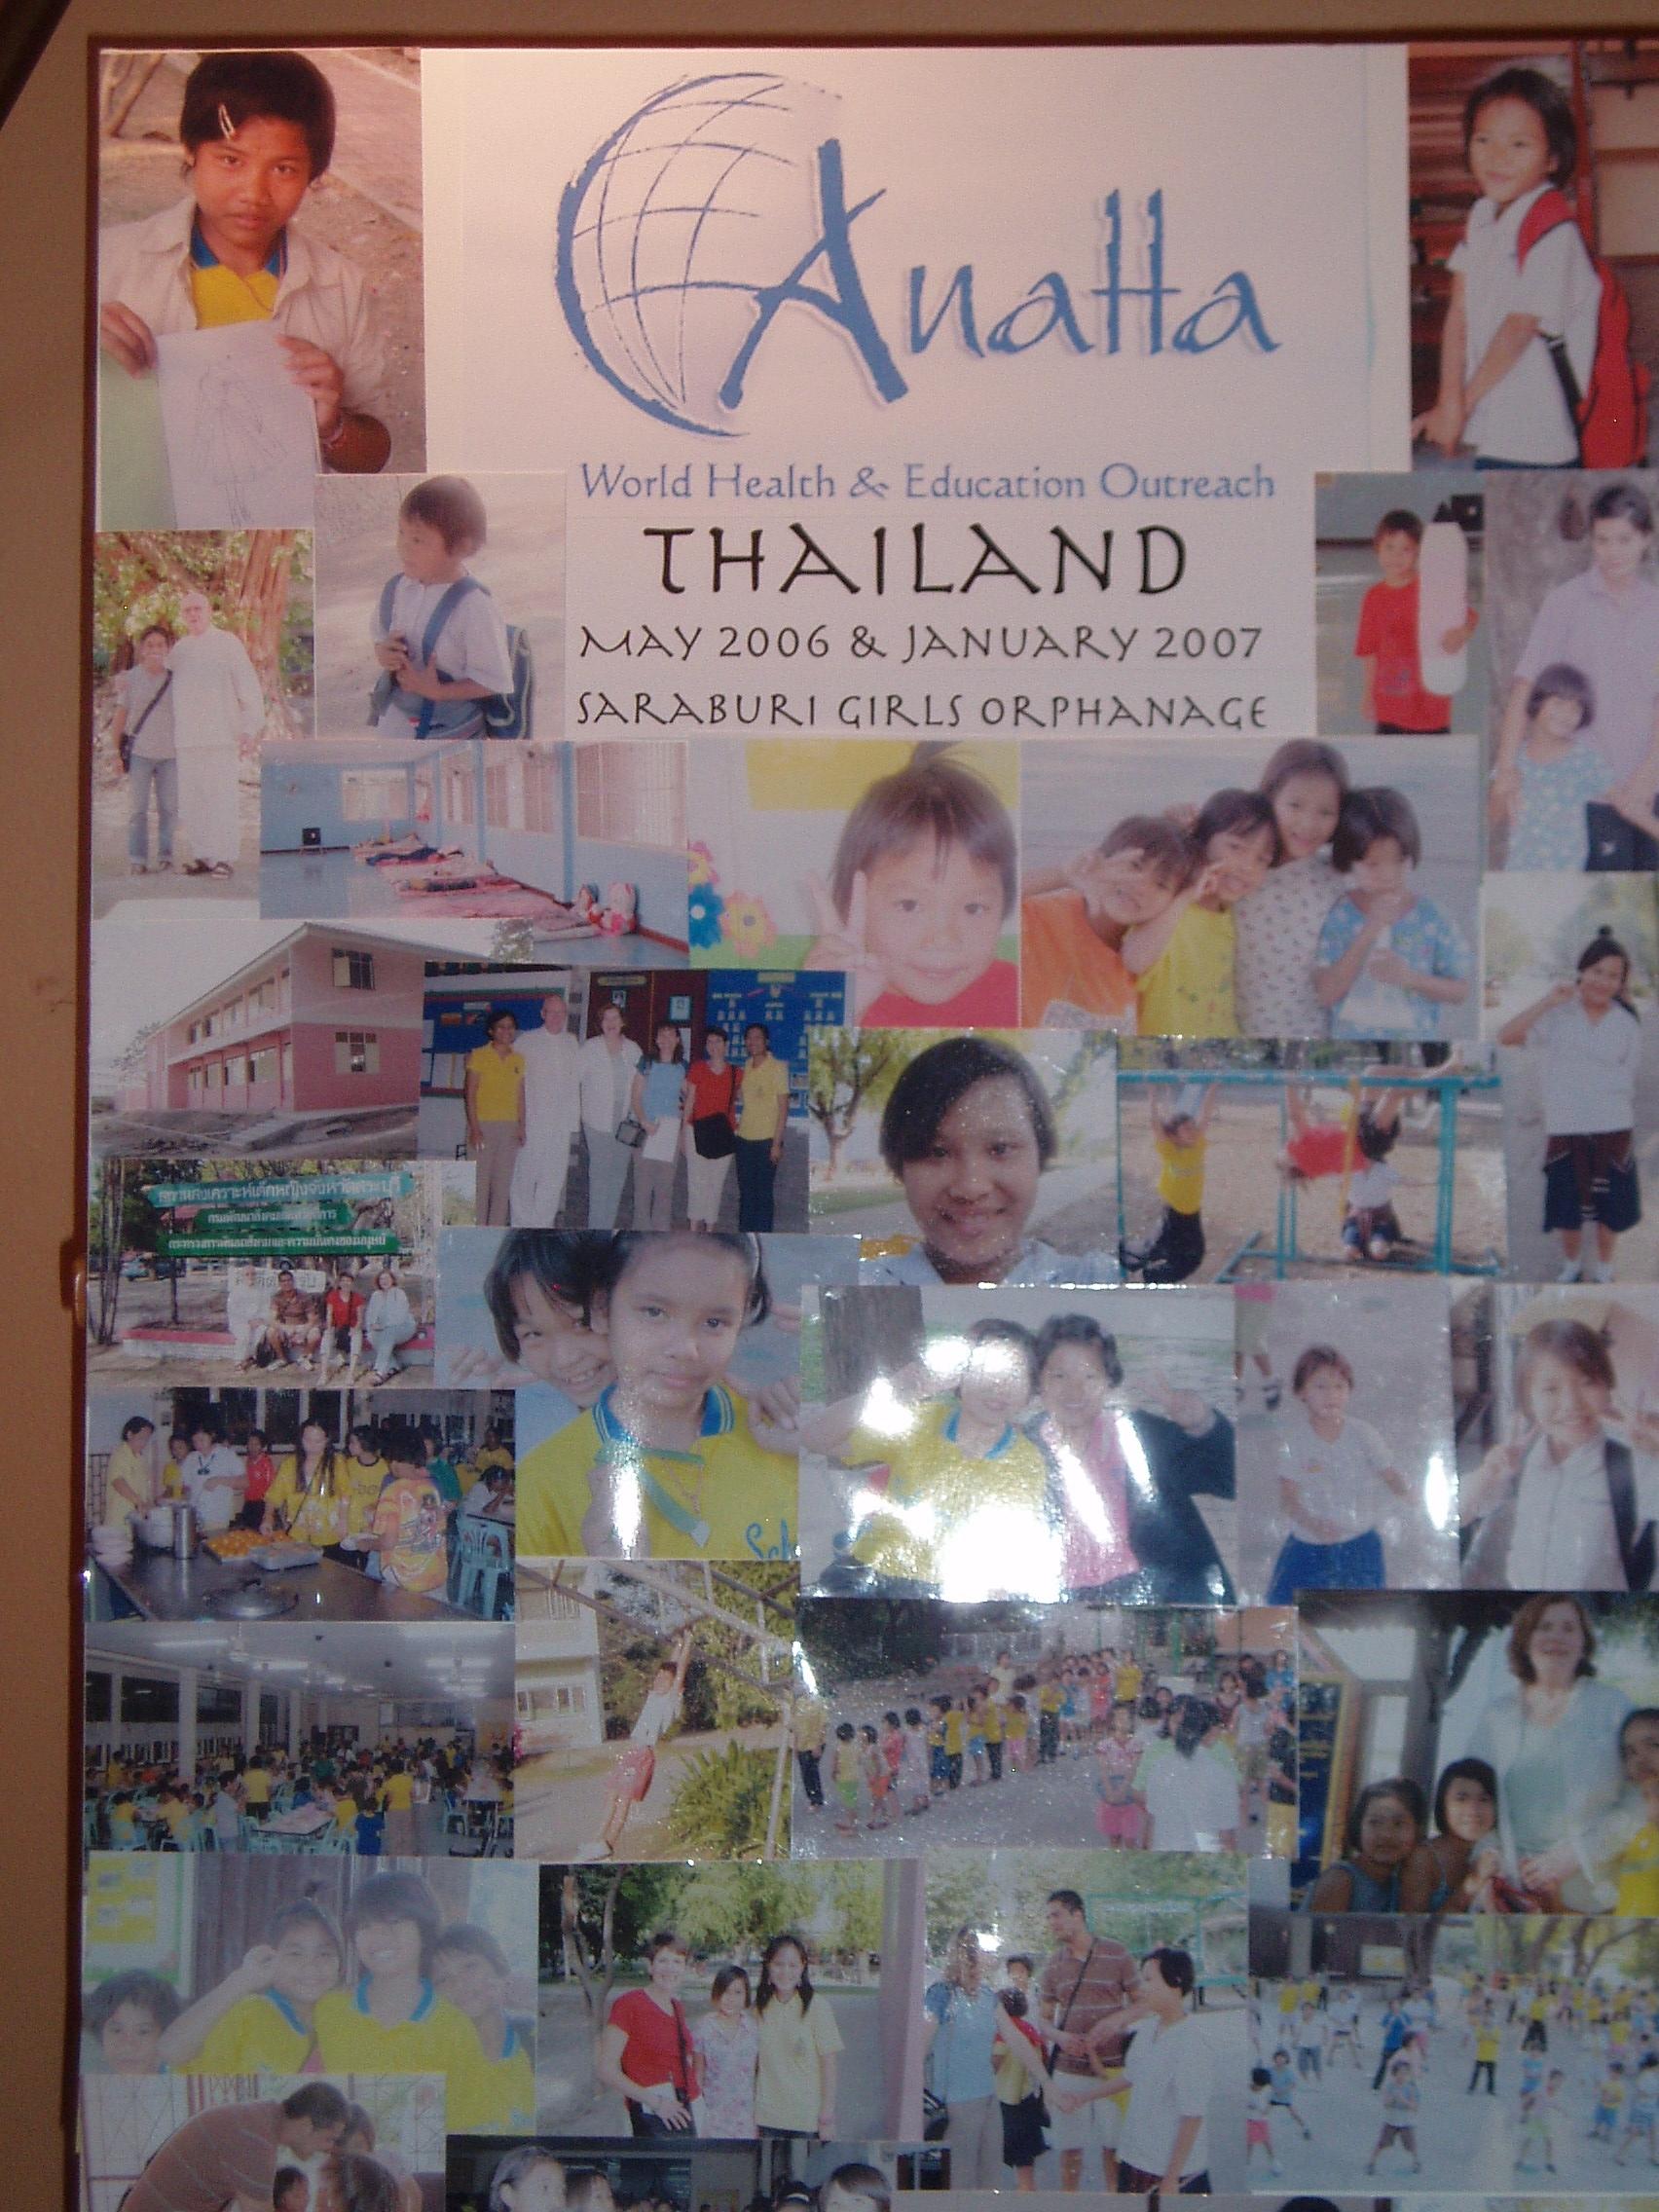 Thailand Poster 9:07.jpg